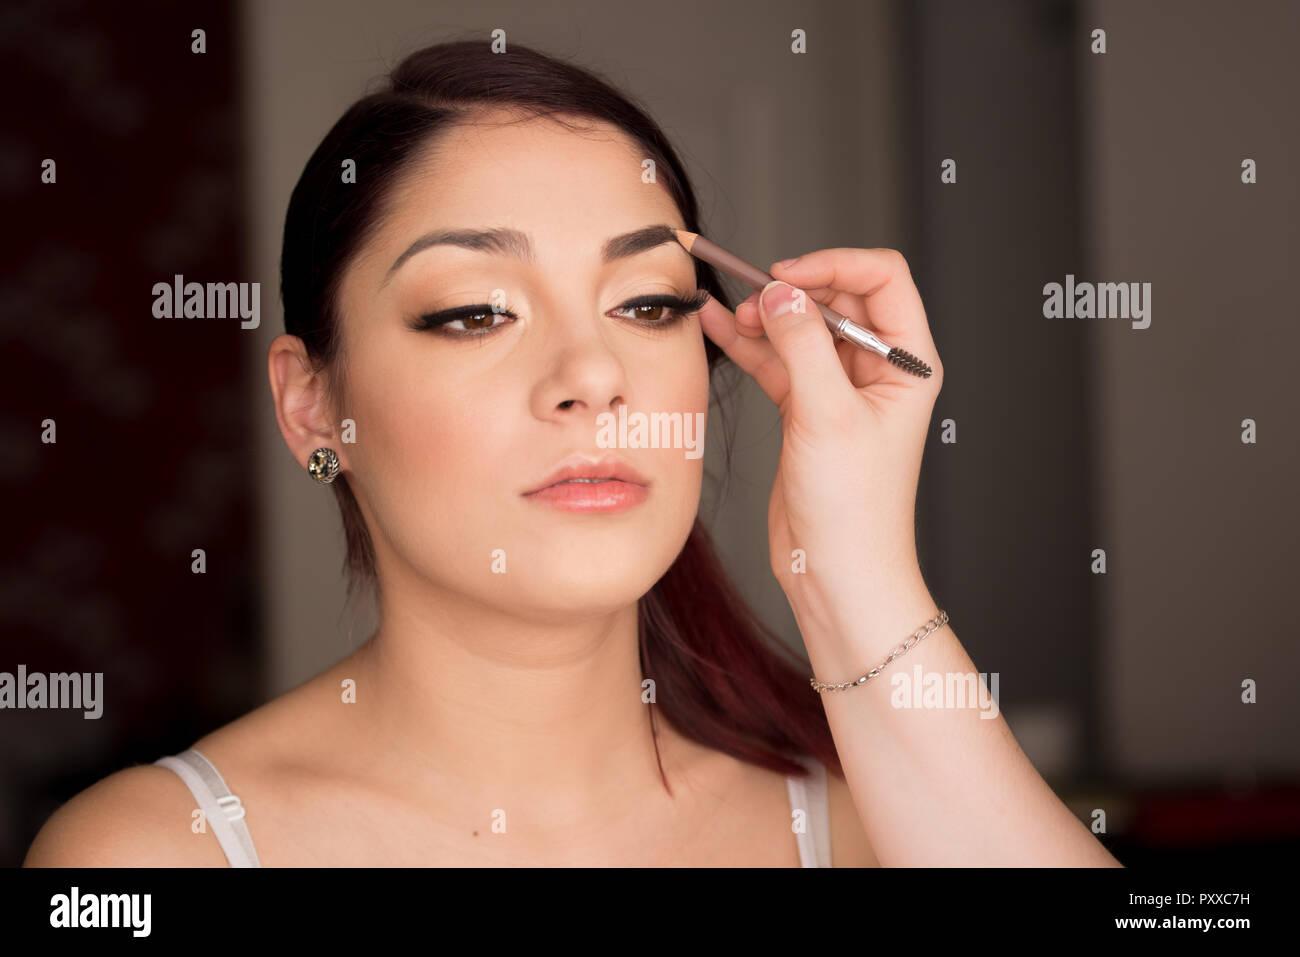 Retouche Maquillage Modele Feminin Avec Crayon Sourcils Brun Photo Stock Alamy